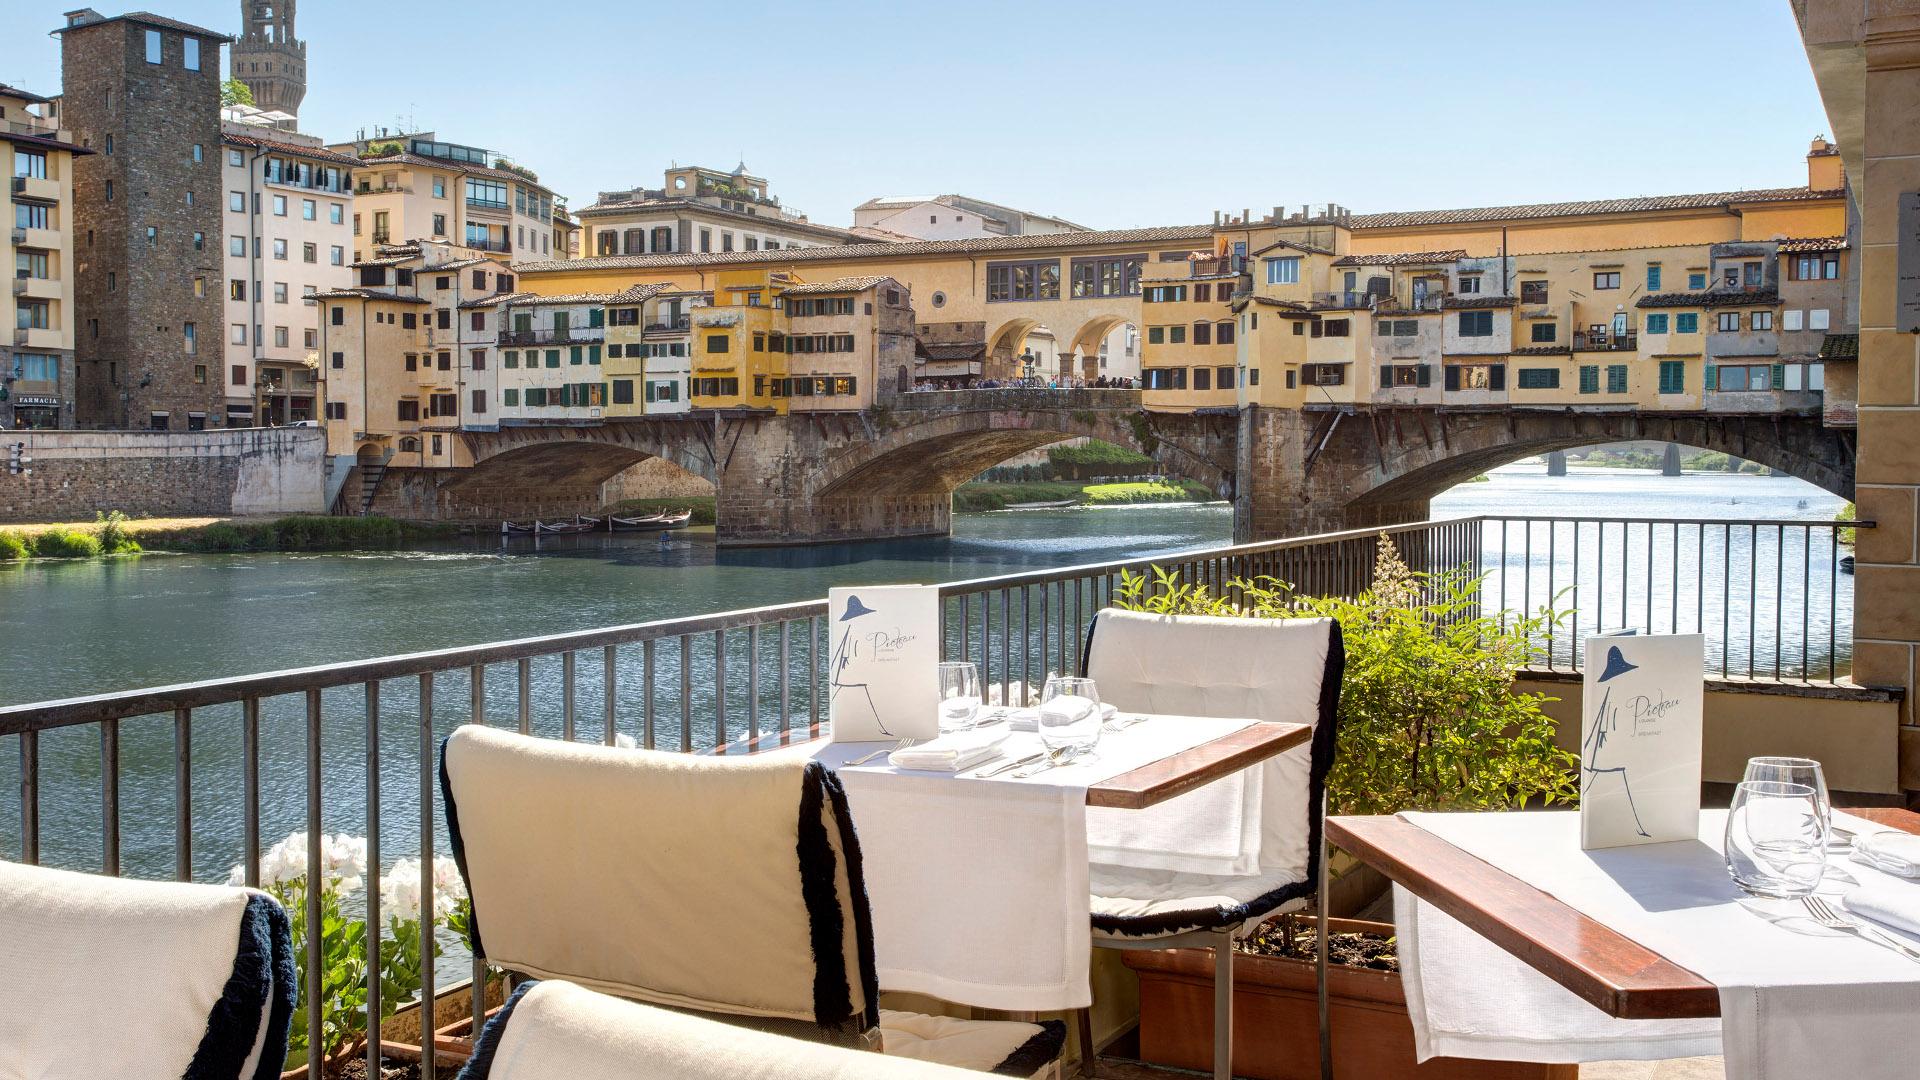 Image:  Hotel Lungarno